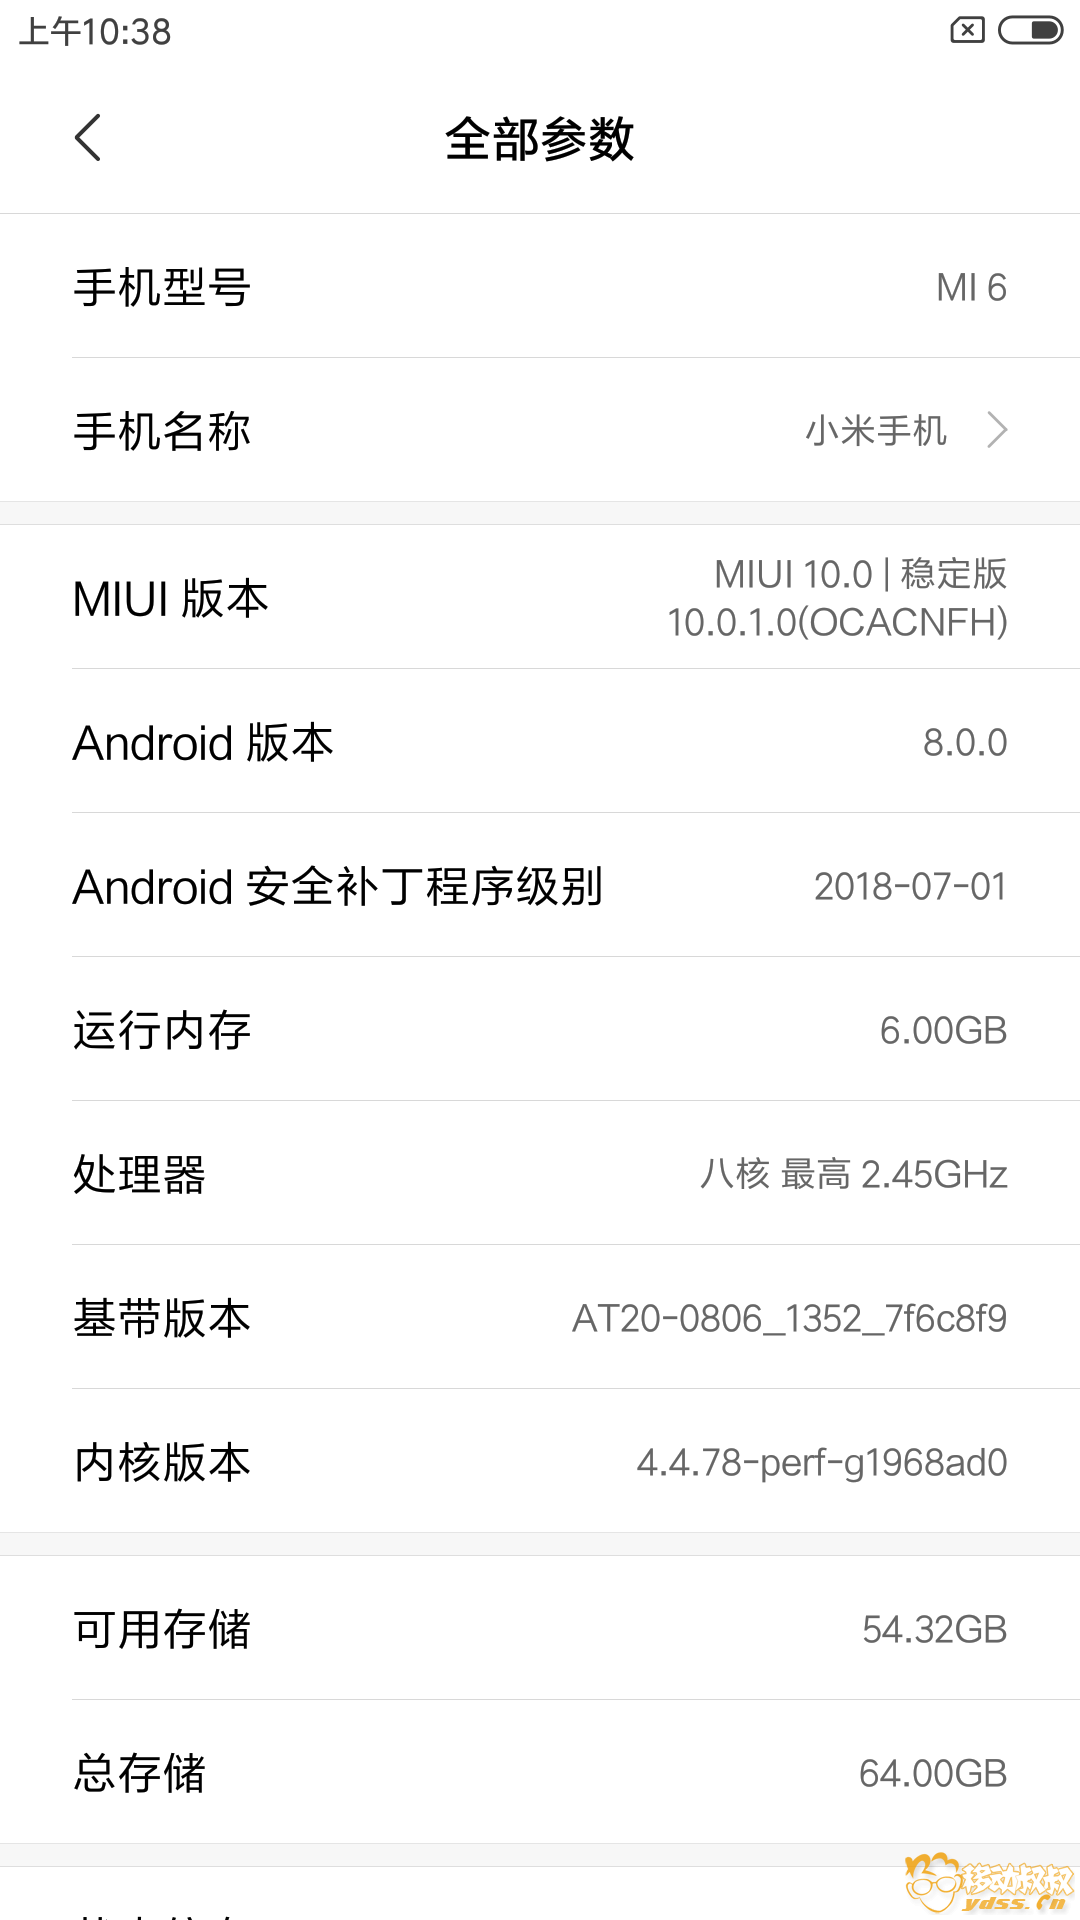 Screenshot_2018-09-05-10-38-18-192_com.android.se.png